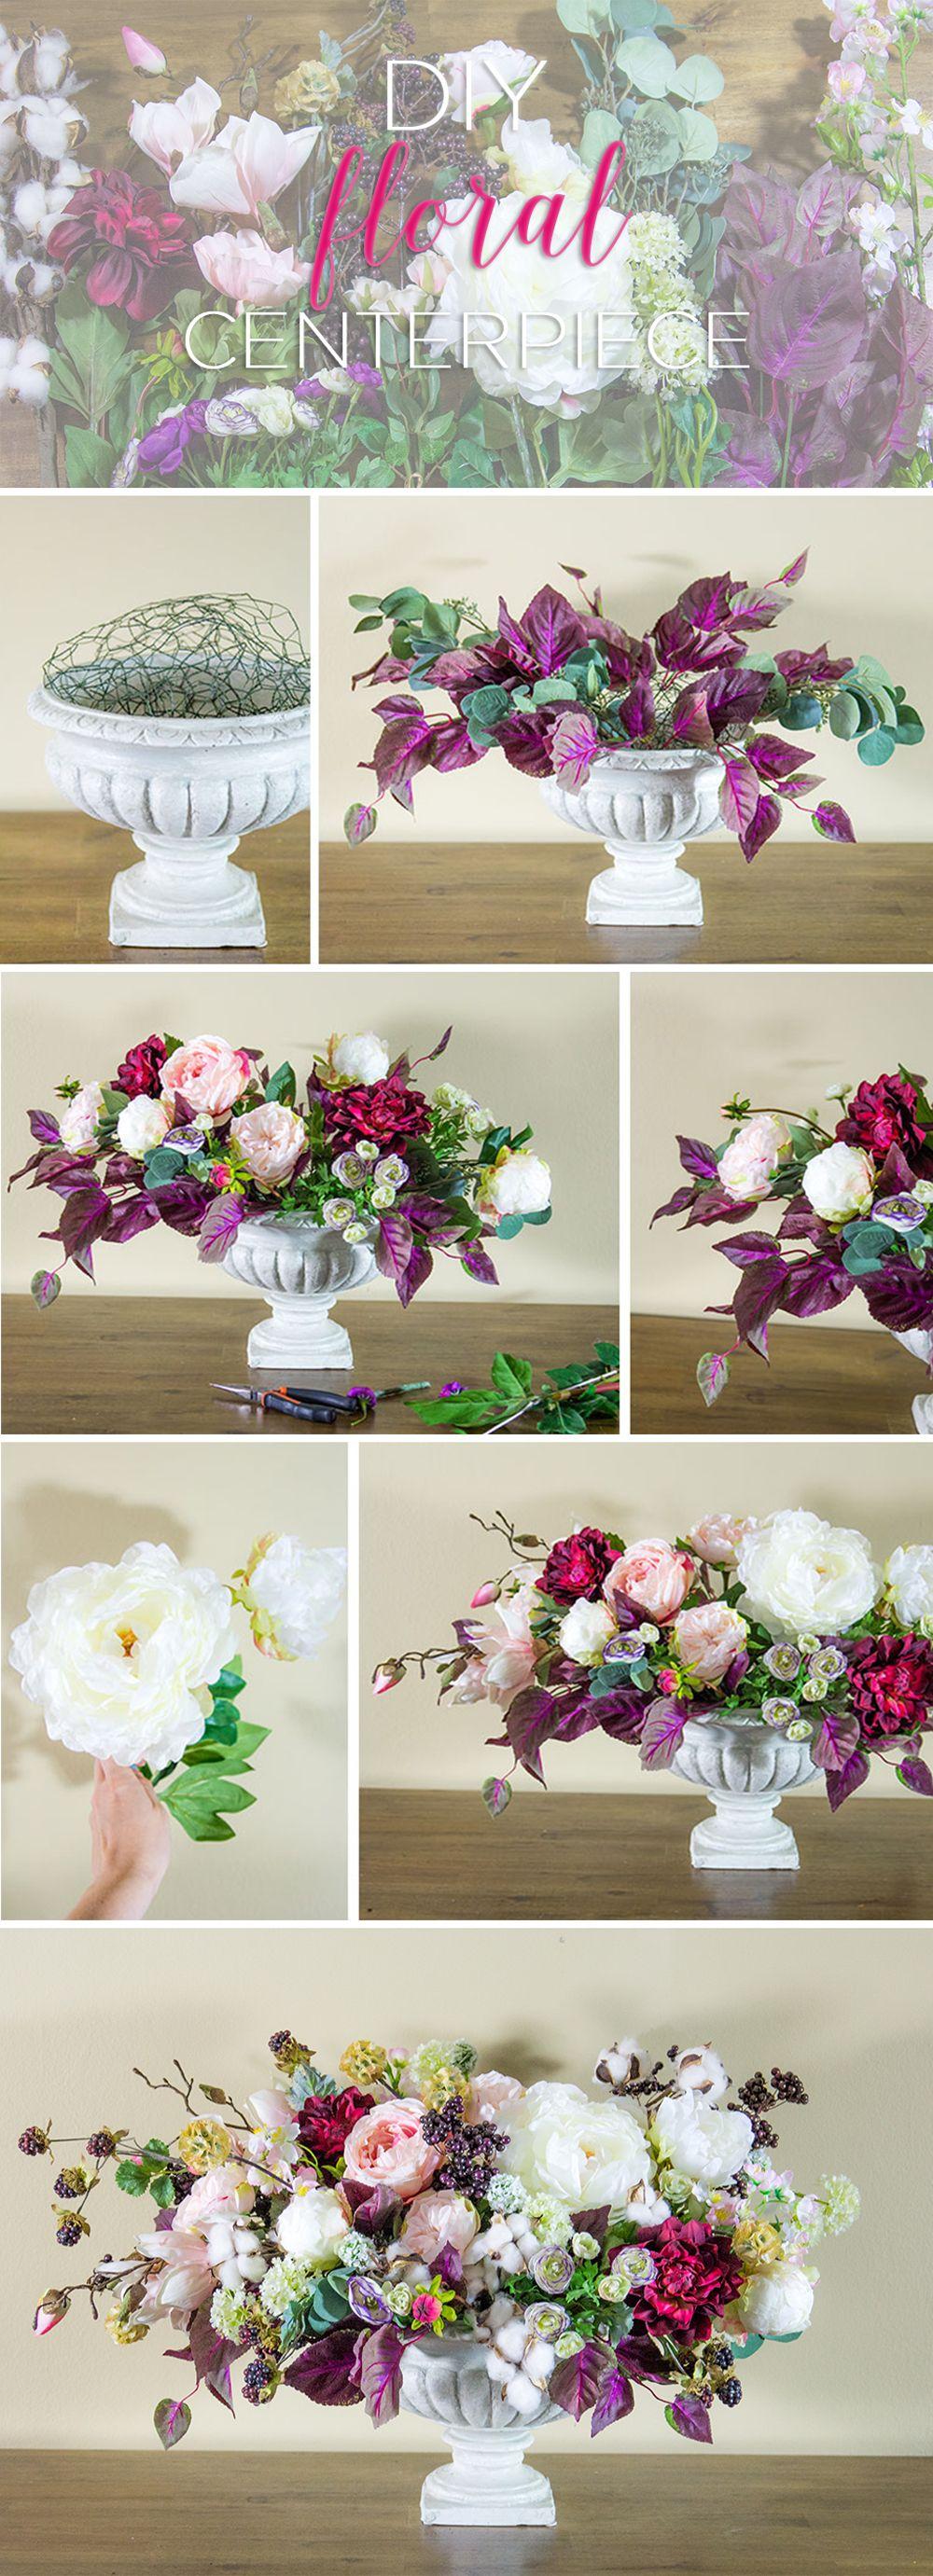 Diy Floral Centerpiece Floral Centerpieces Silk Flowers And Lush